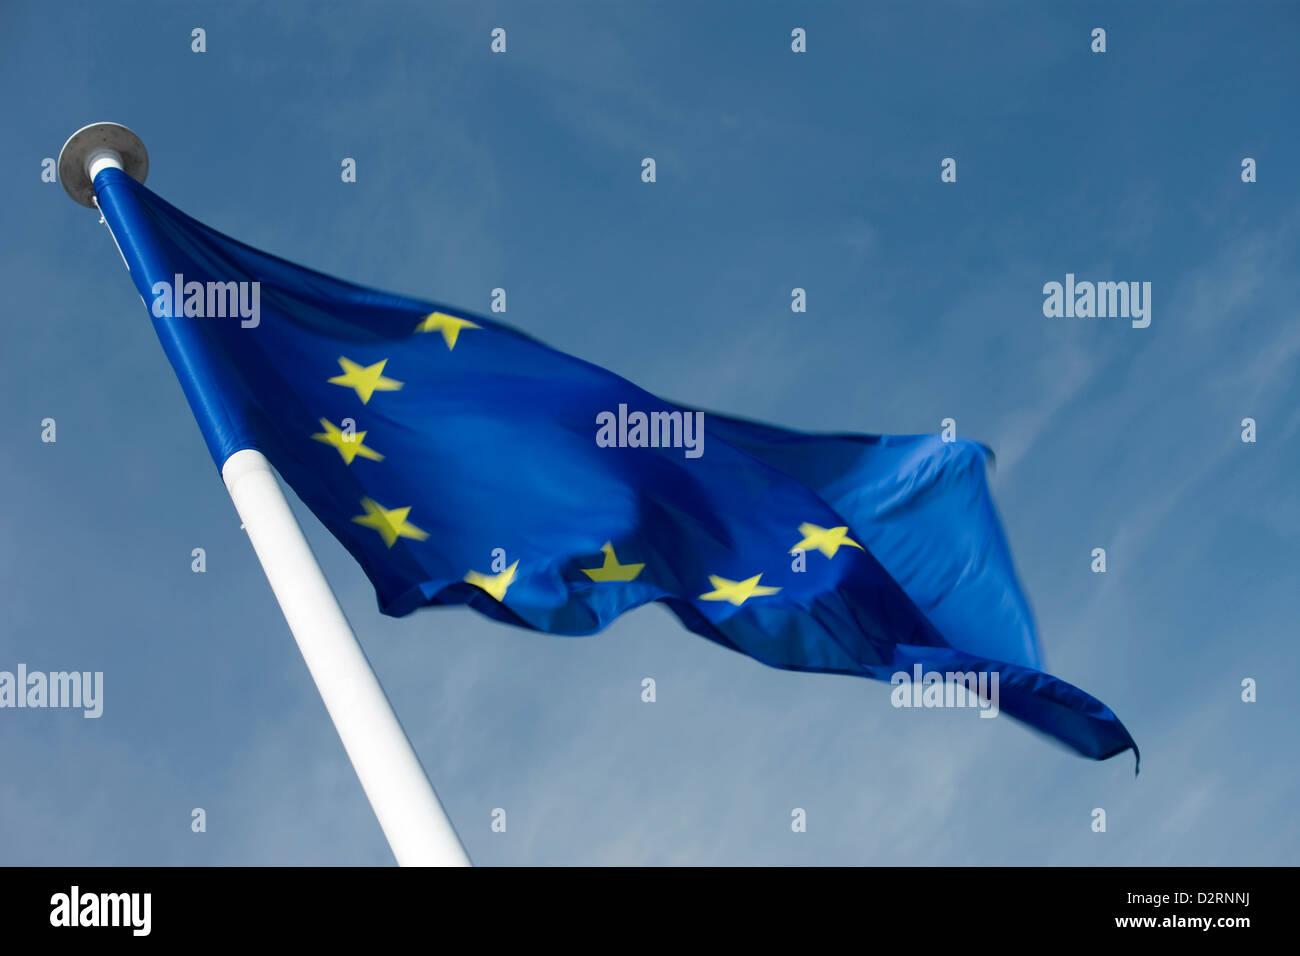 EUROPEAN UNION COUNCIL OF EUROPE EU FLAG ON FLAGPOLE - Stock Image